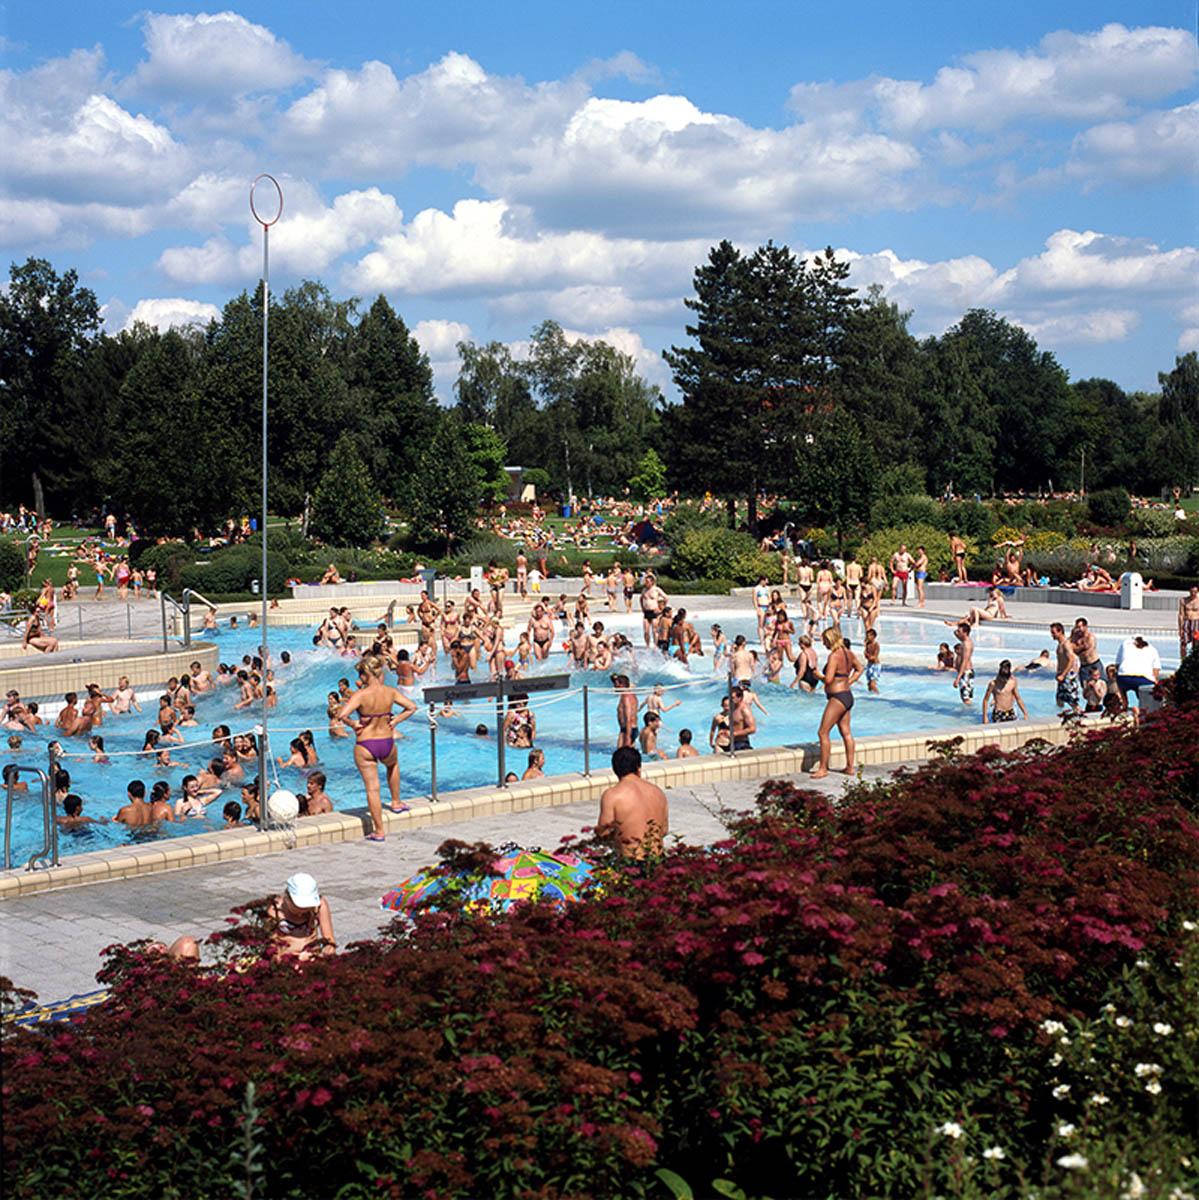 The Bathers Diary_Yael Engelhart_8